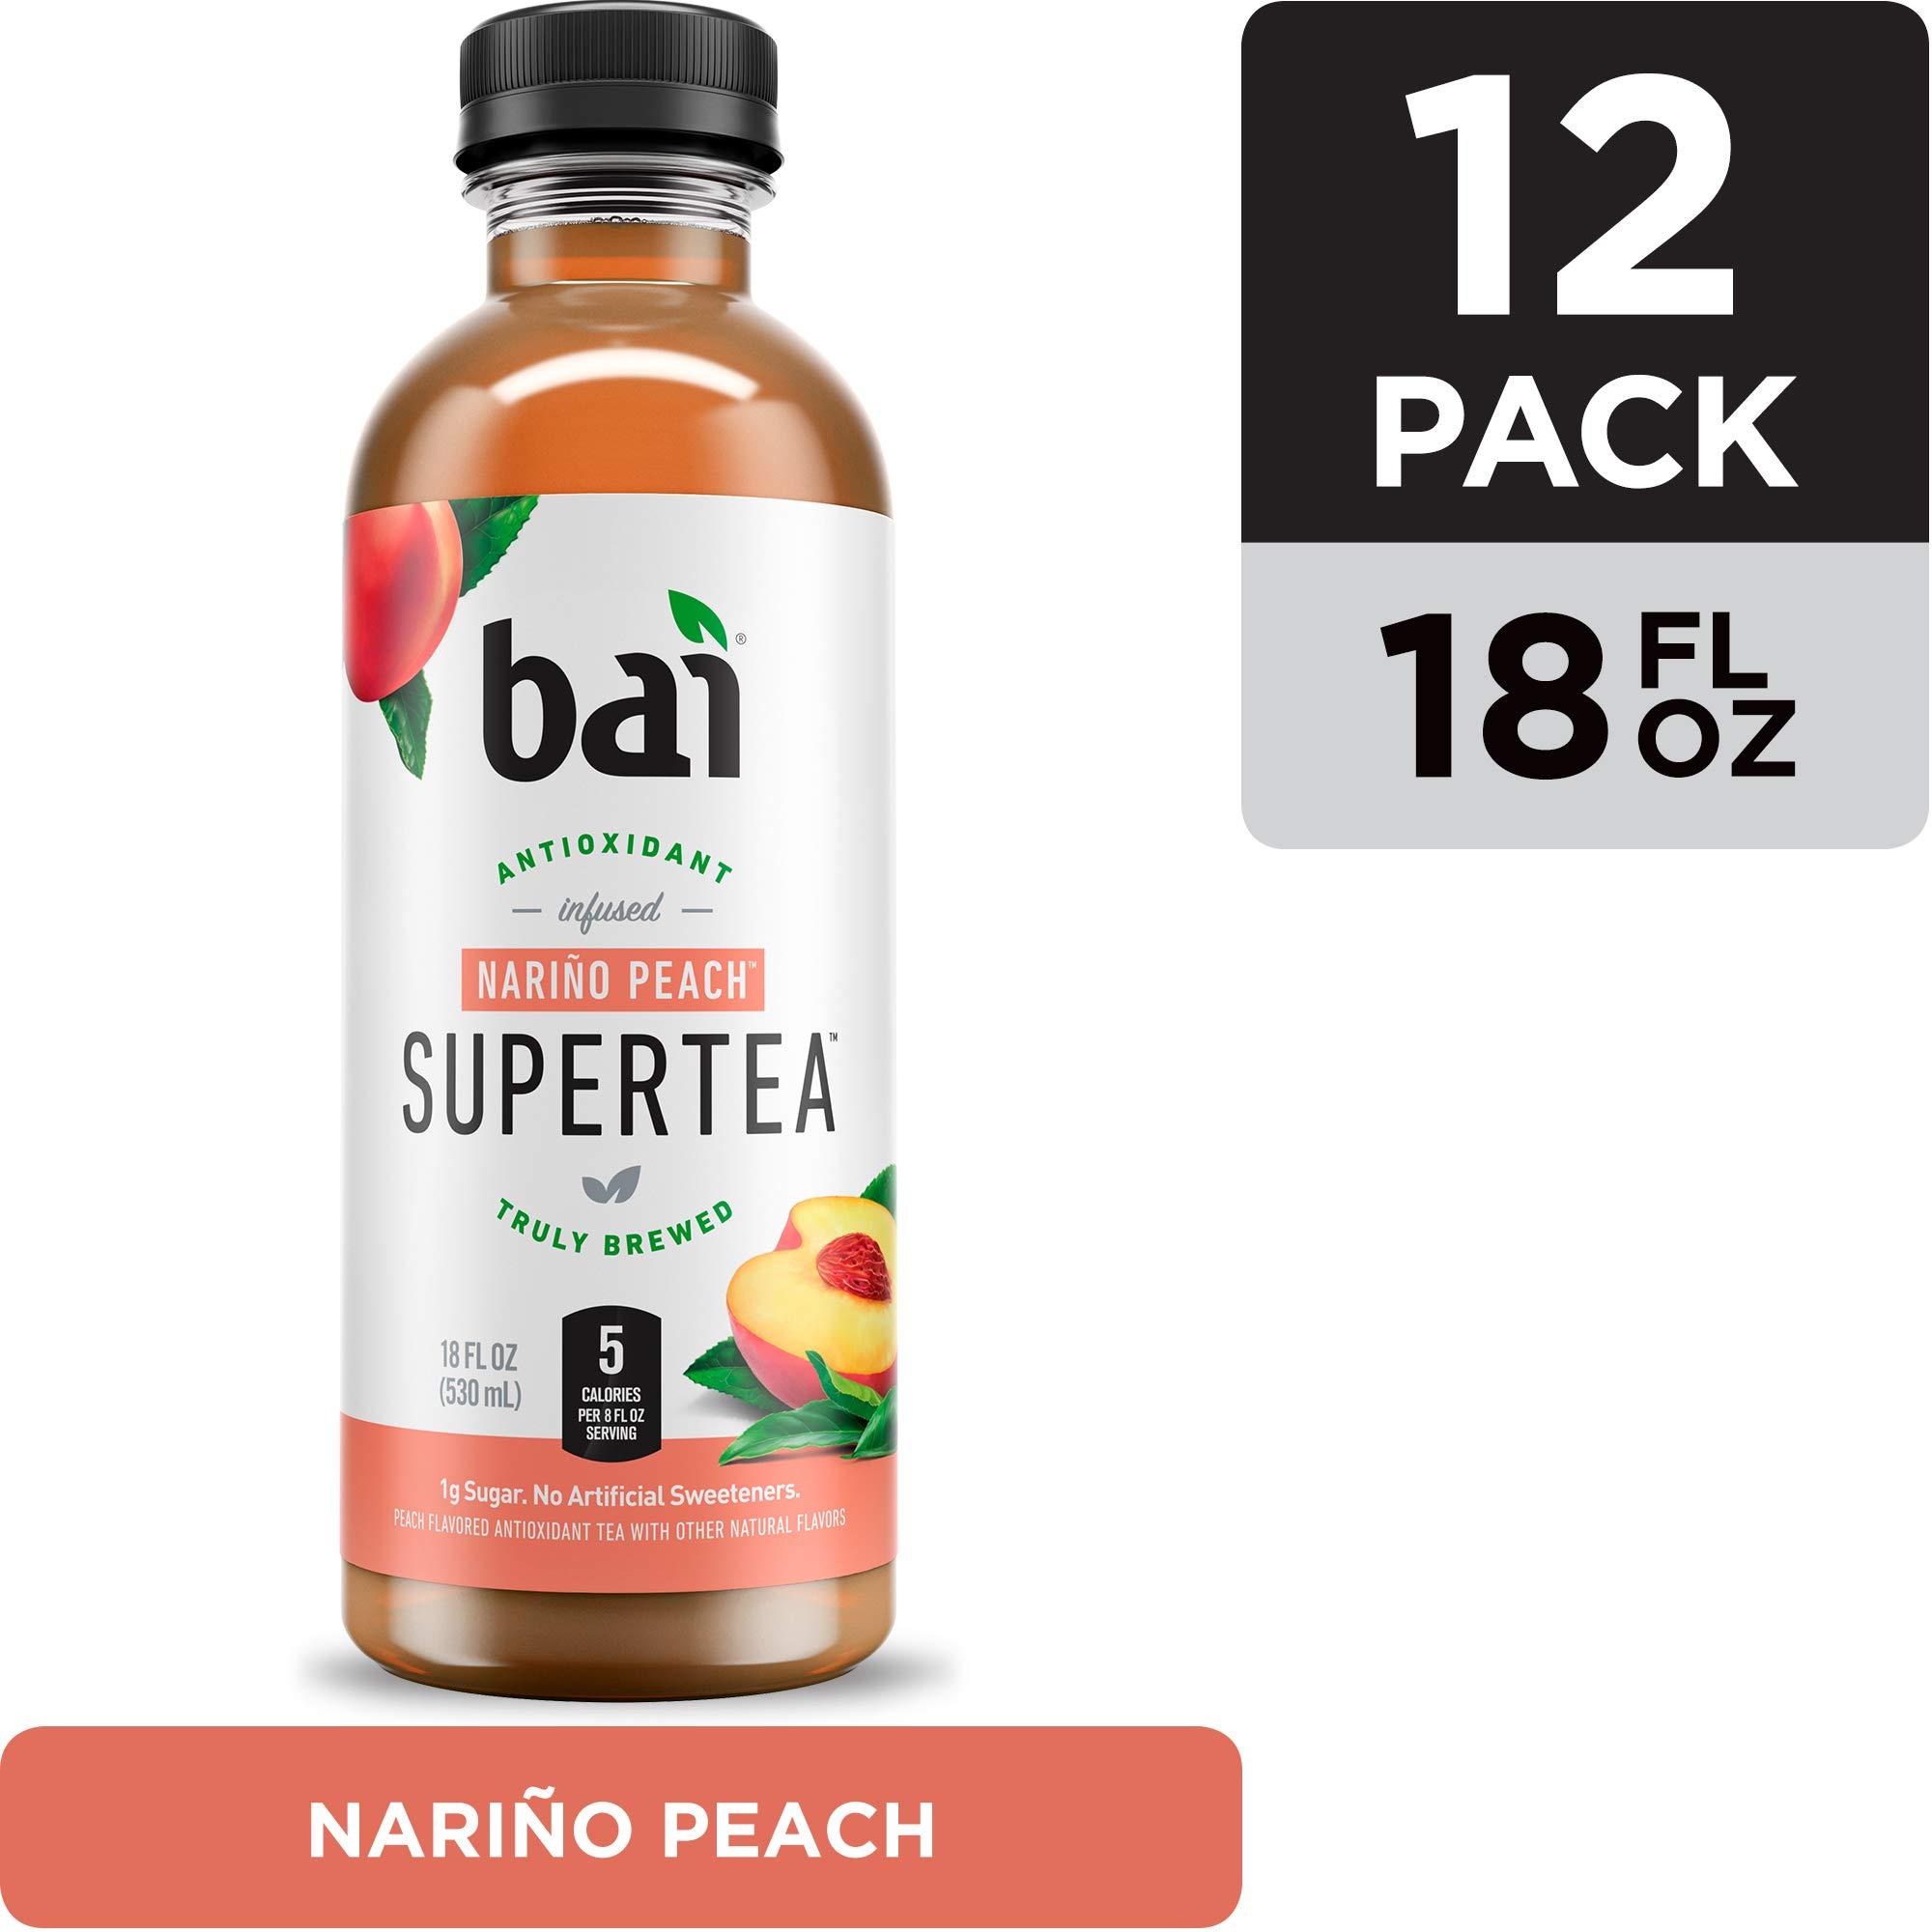 Bai Iced Tea, Narino Peach, Antioxidant Infused Supertea, Crafted with Real Tea (Black Tea, White Tea), 18 Fluid Ounce Bottles, 12 count by BAI